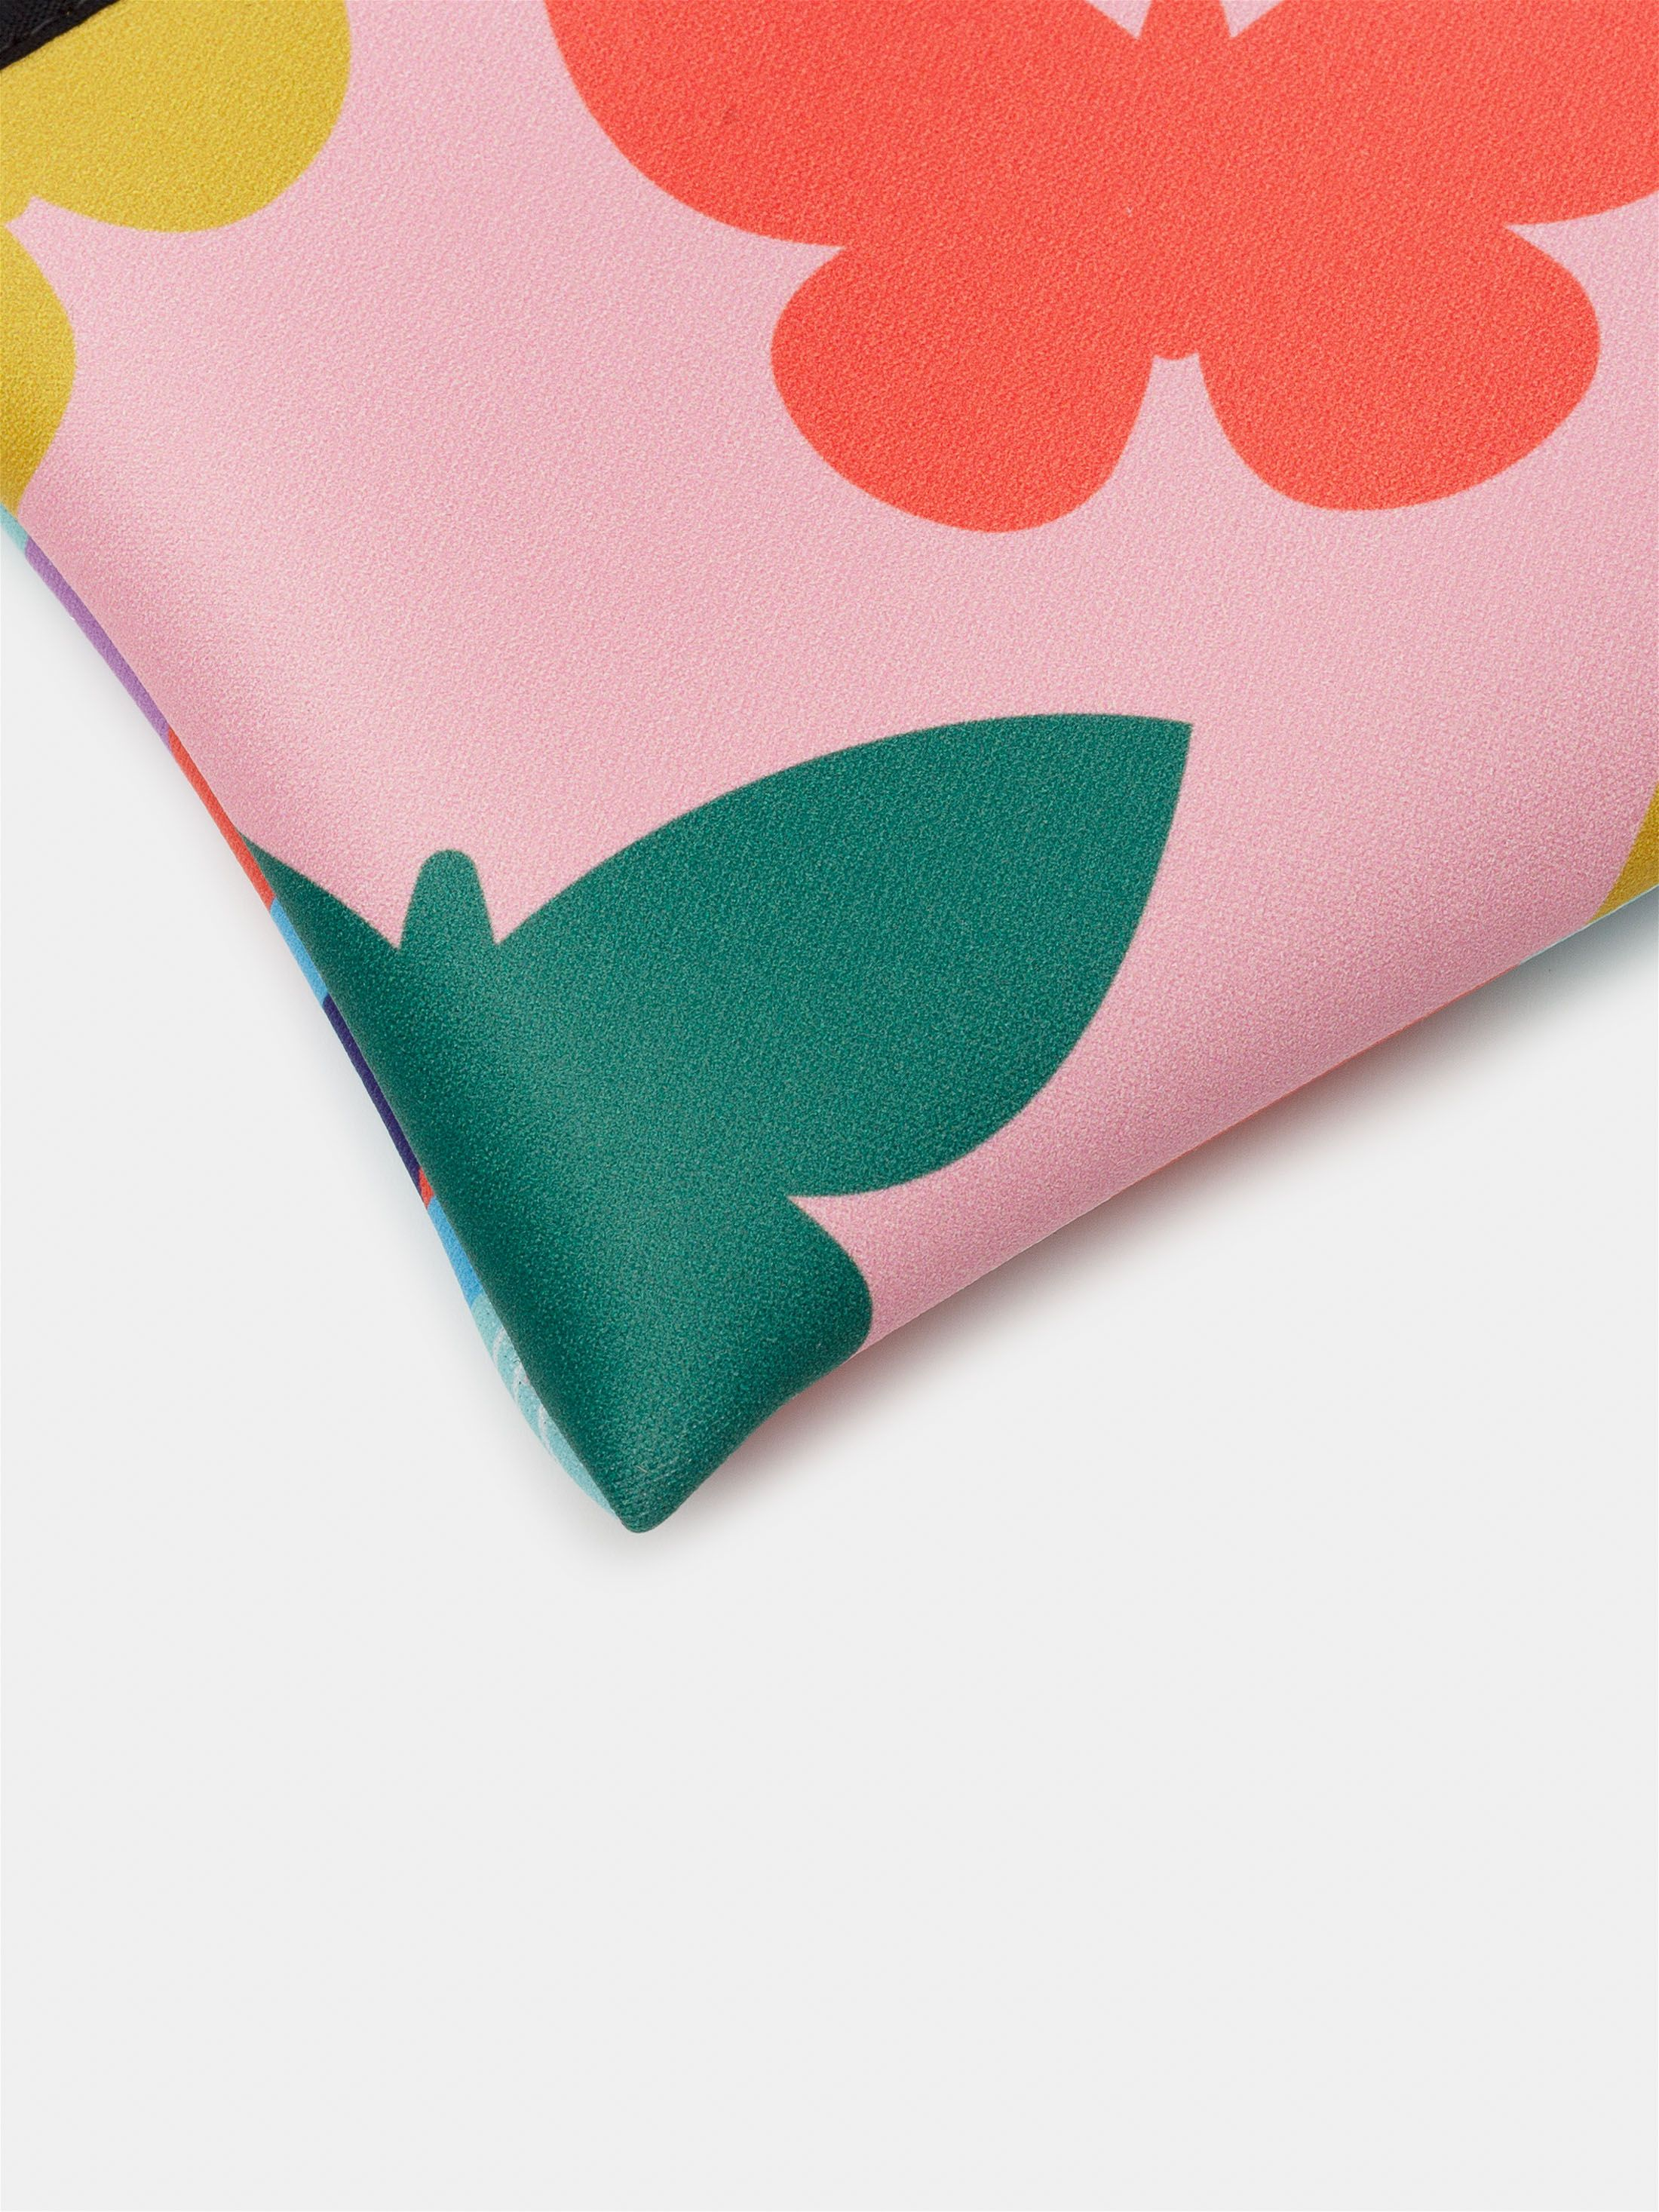 pochette zippée imprimée